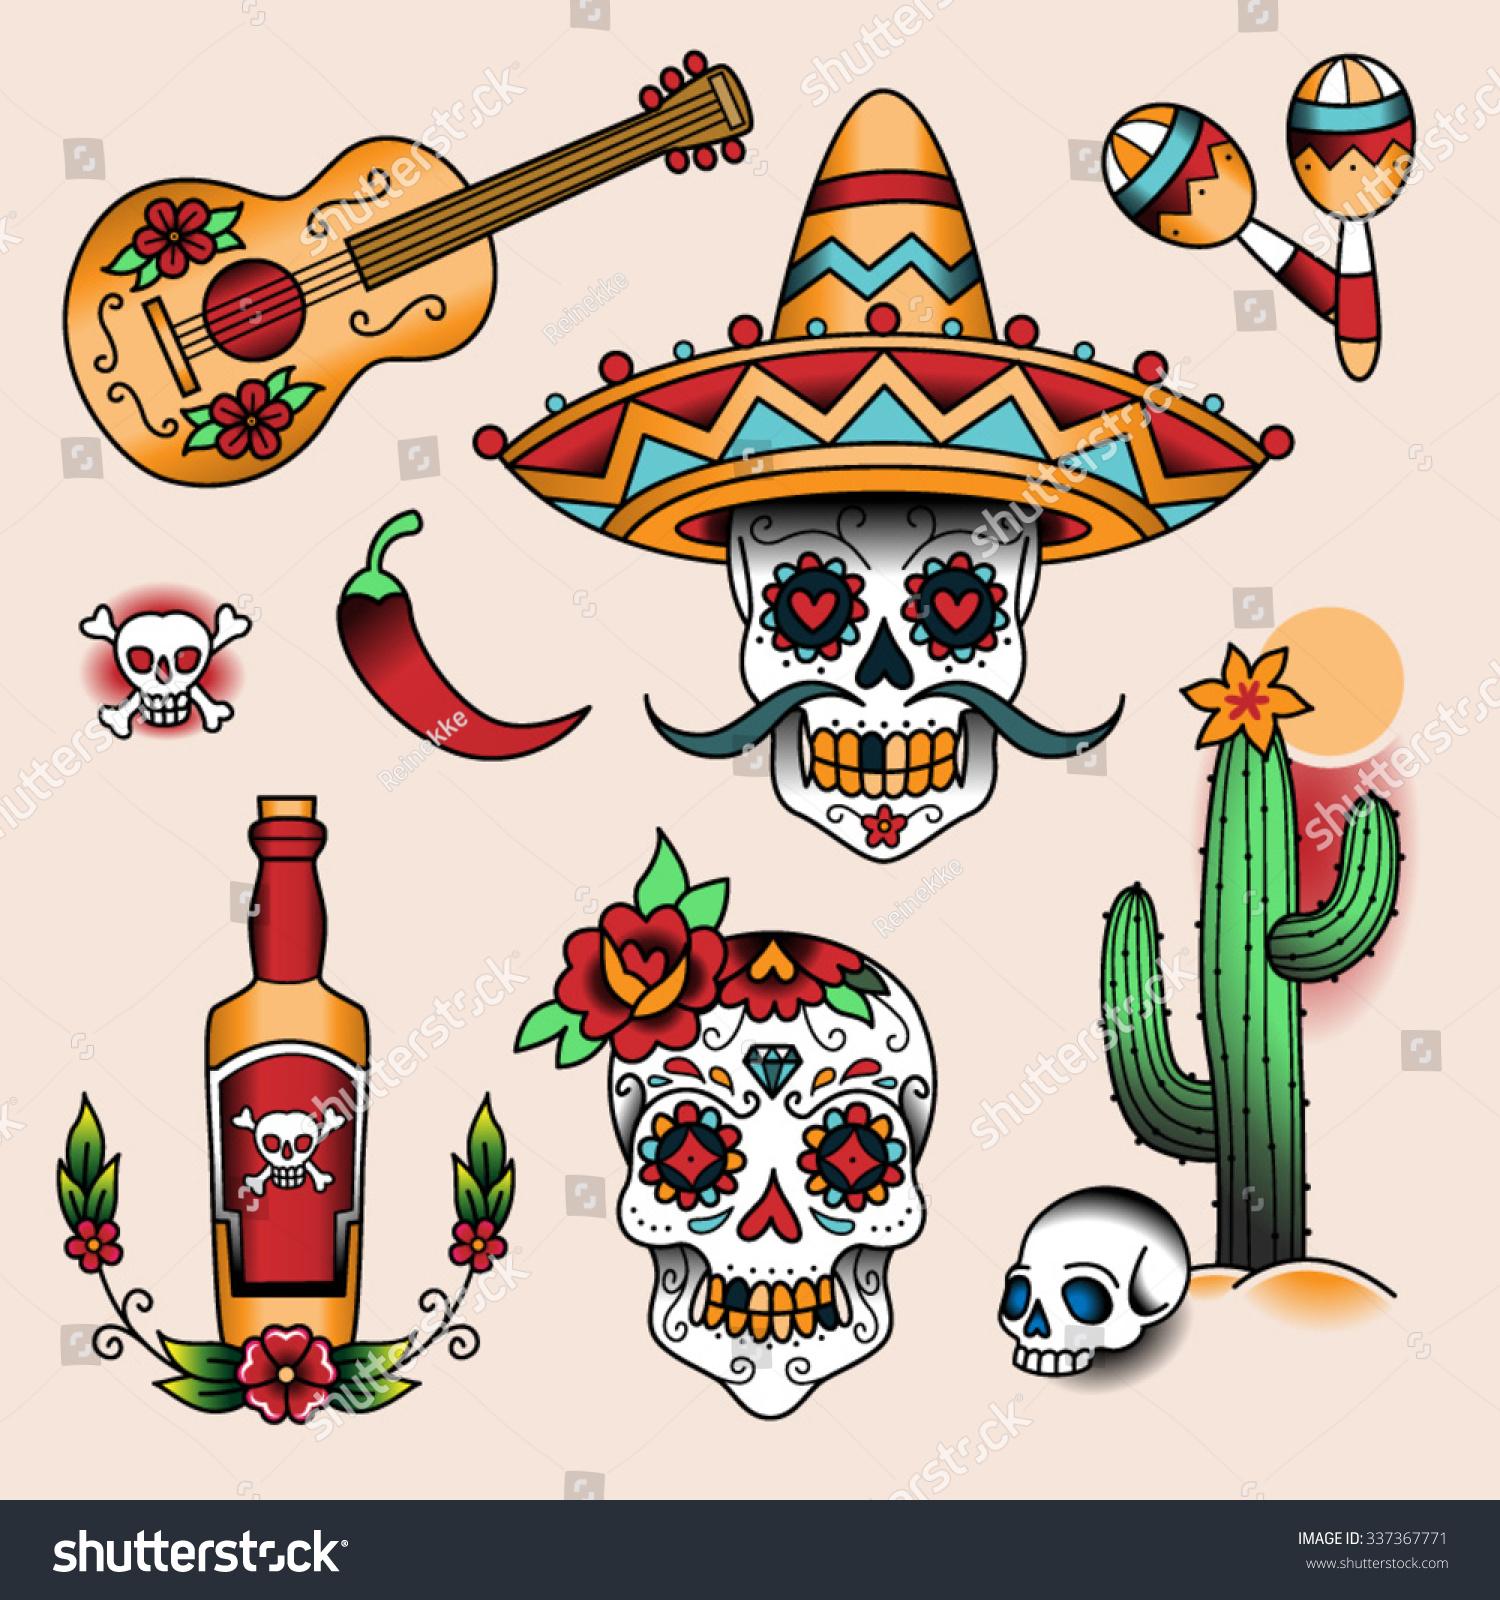 mexican symbols set color tattoos traditional stock vector 337367771 shutterstock. Black Bedroom Furniture Sets. Home Design Ideas